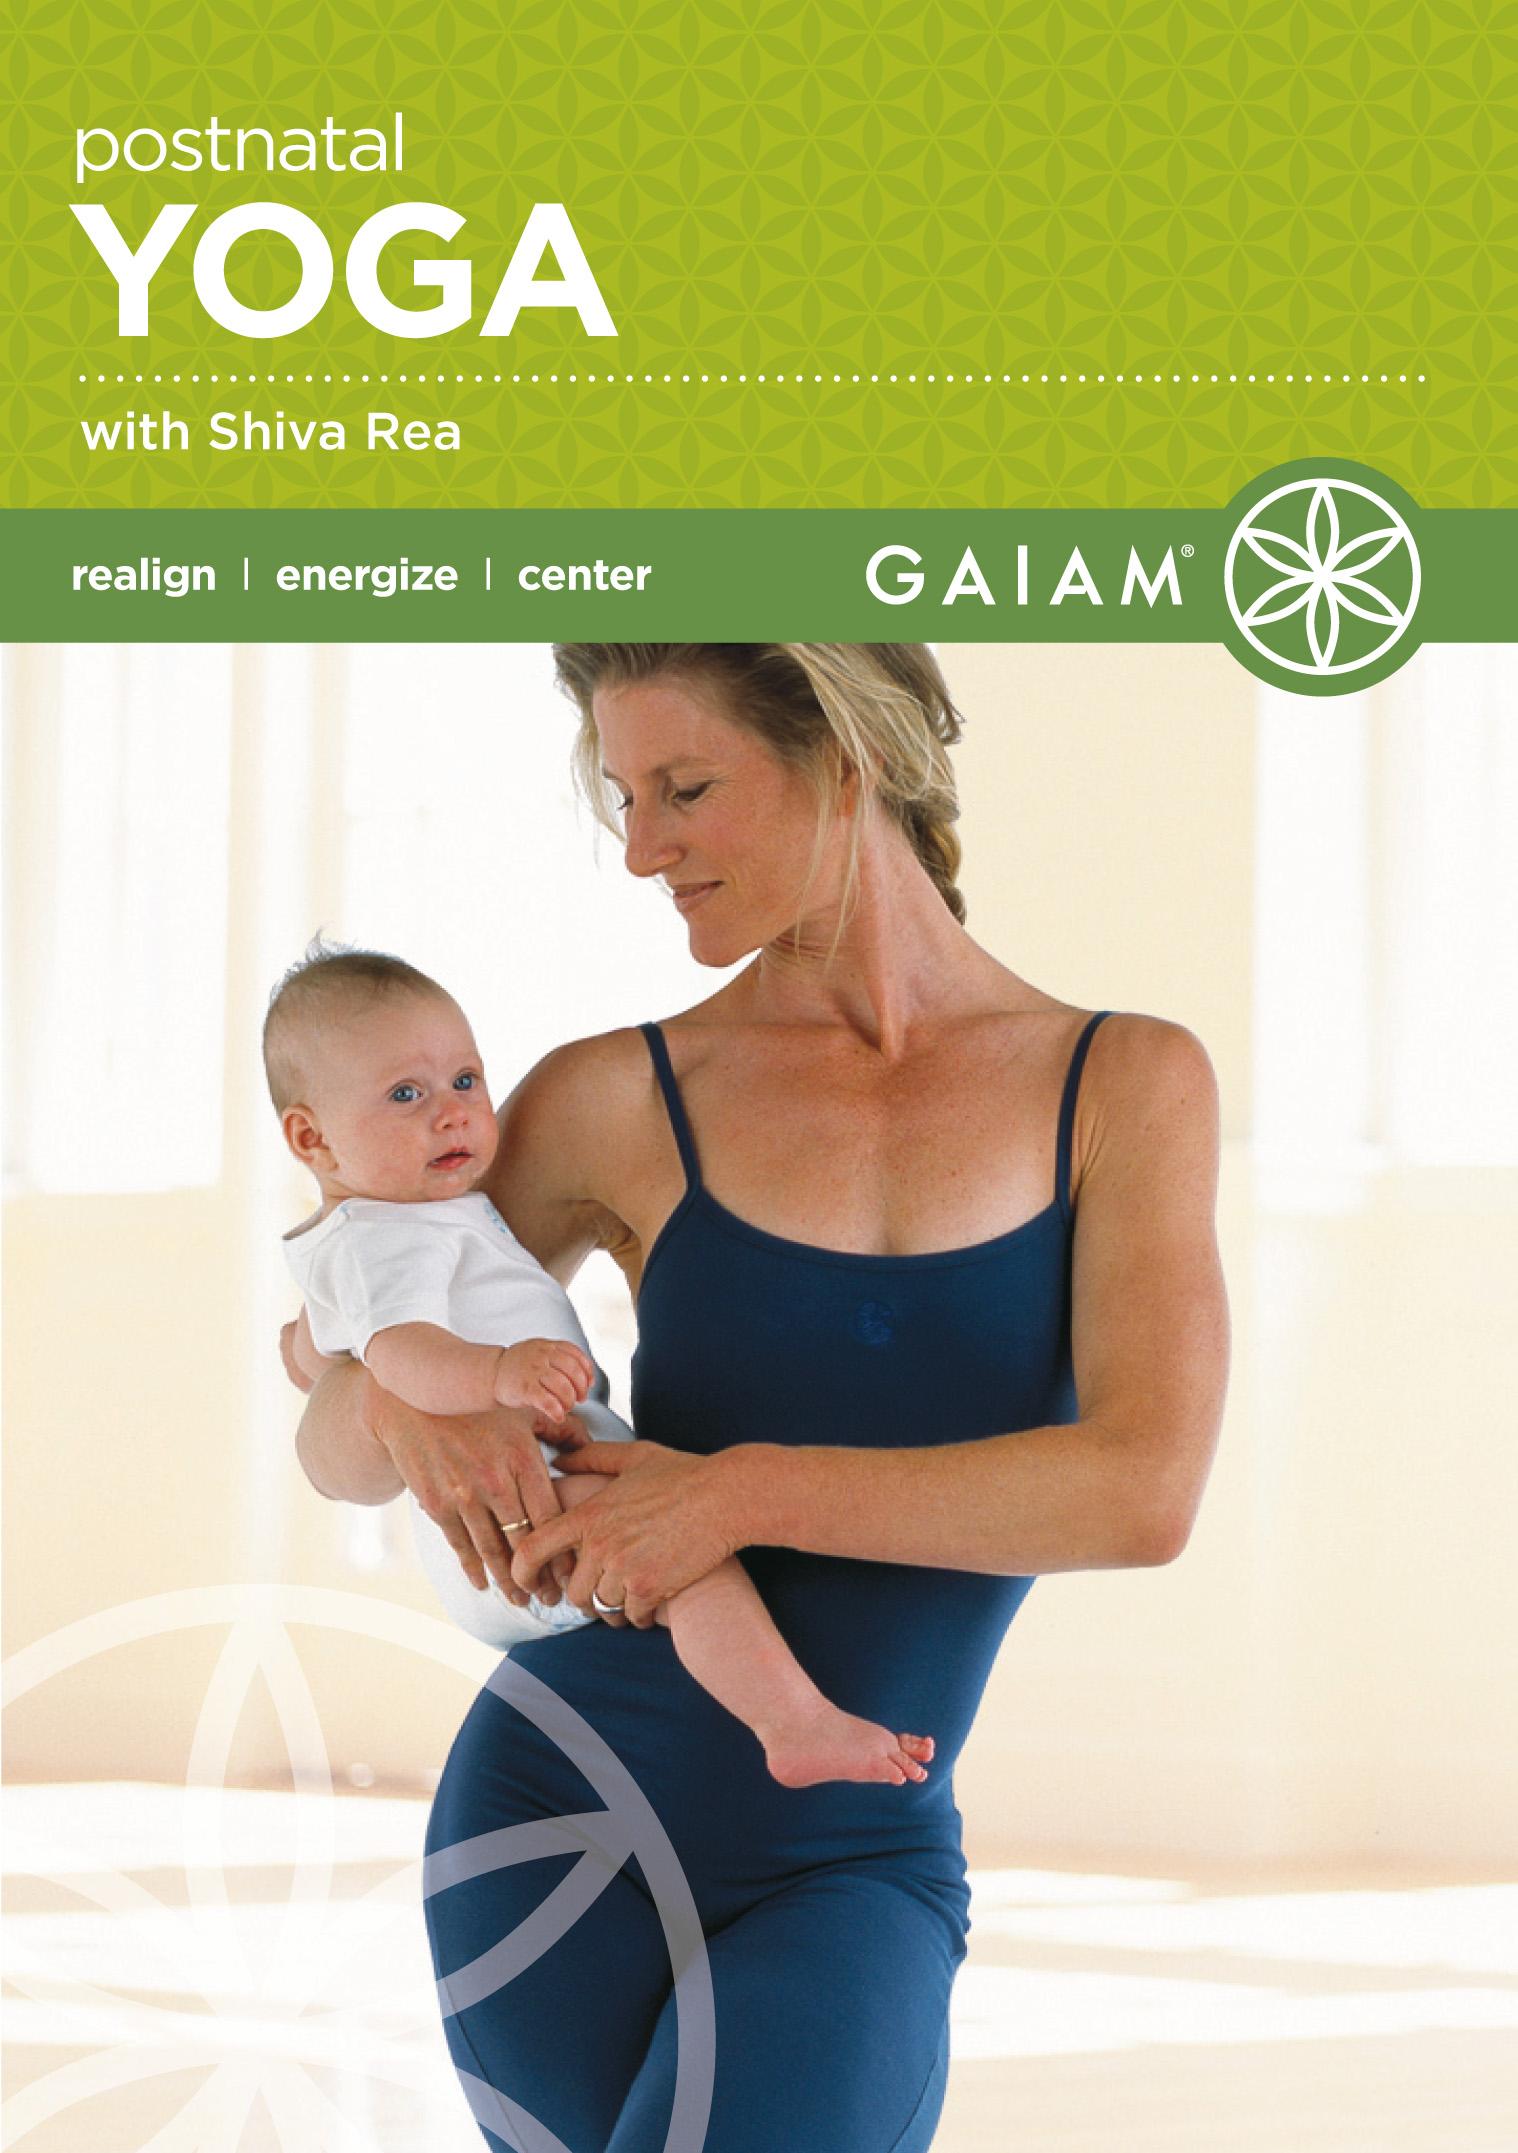 Yoga Journal: Postnatal Yoga